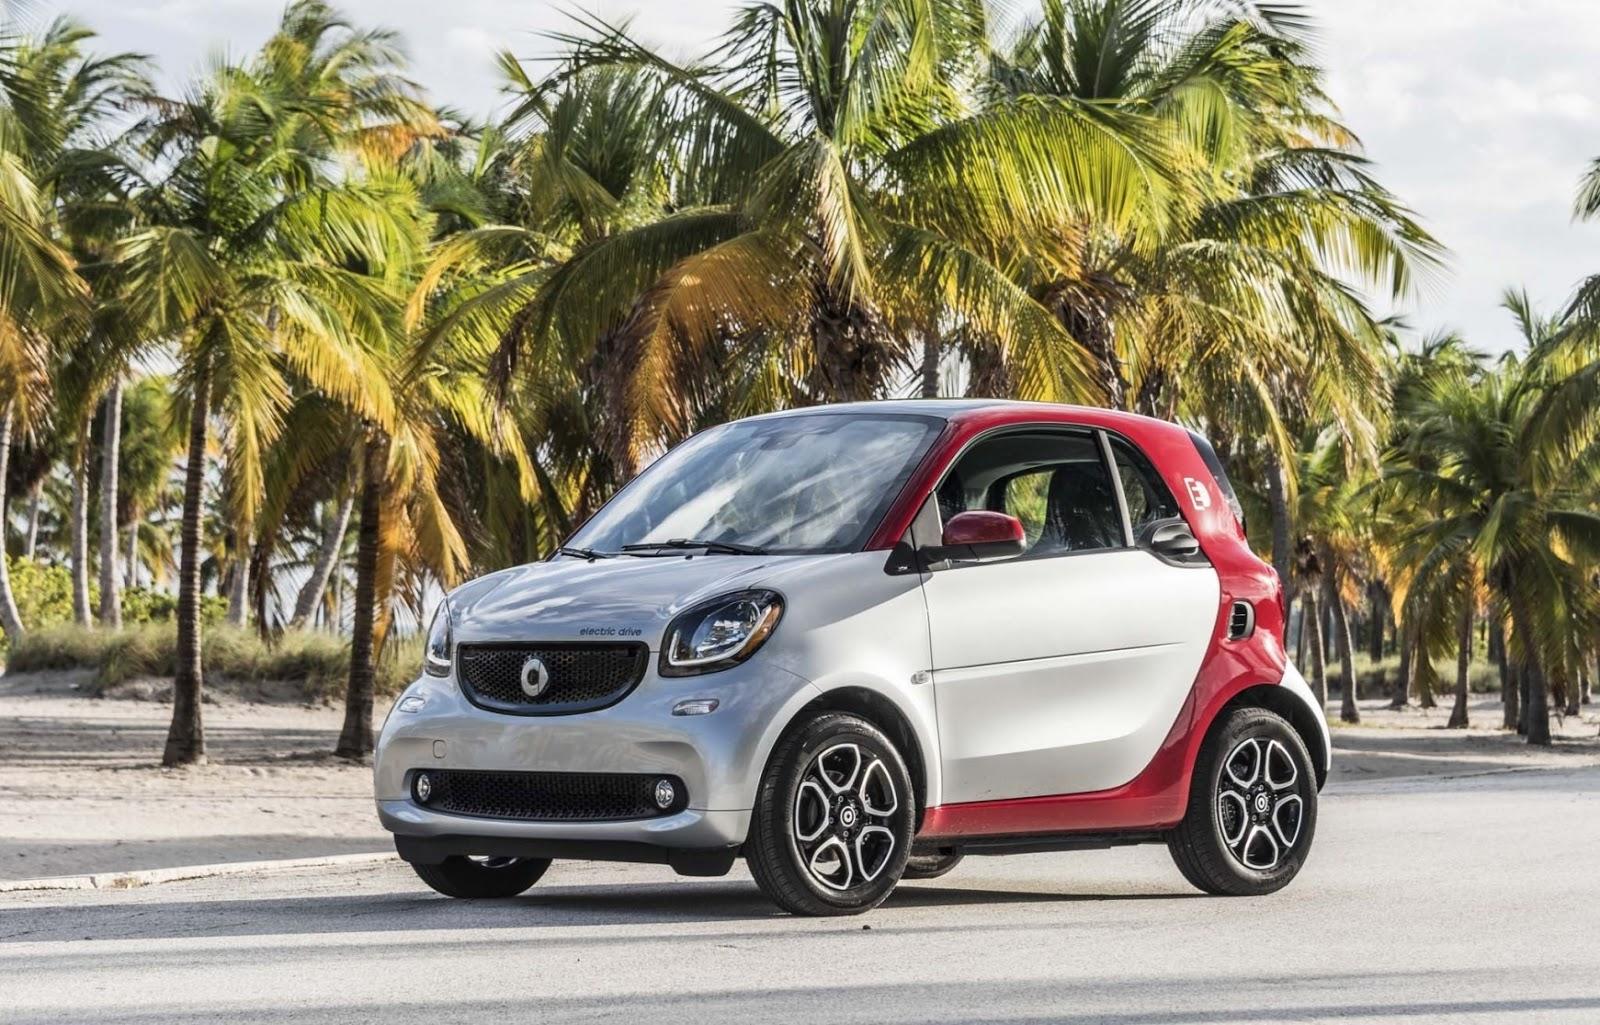 2018 Smart Fortwo Cabrio Forfour